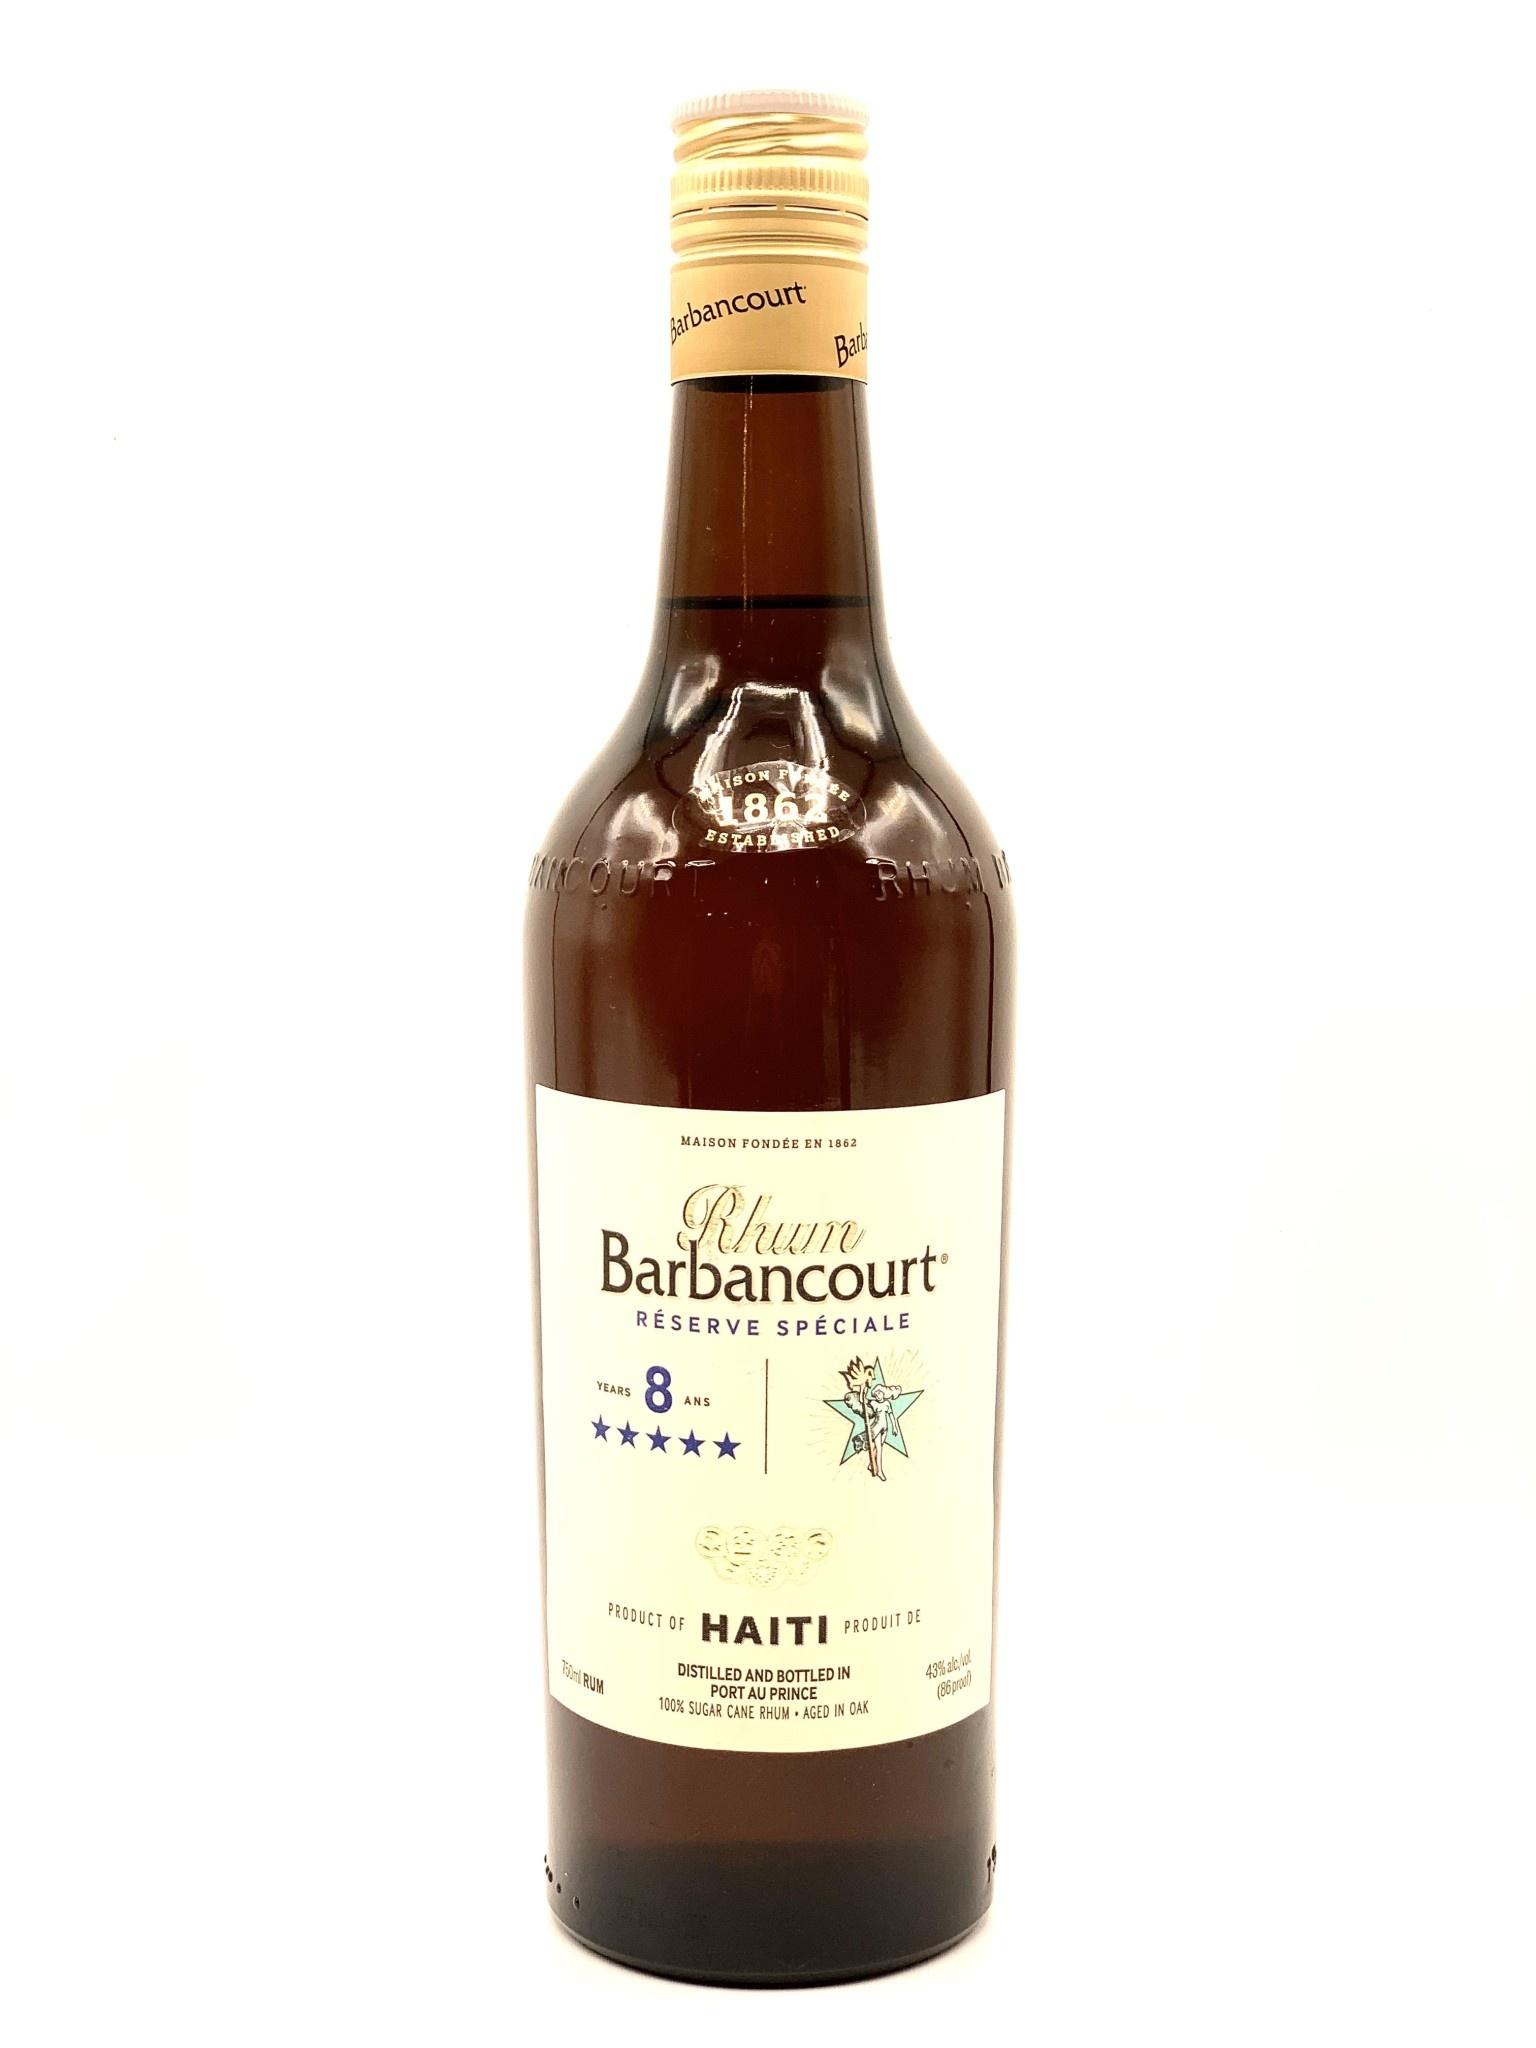 Rhum (Rum) Barbancourt 5 Star Reserve Speciale 750ml (86 Proof)